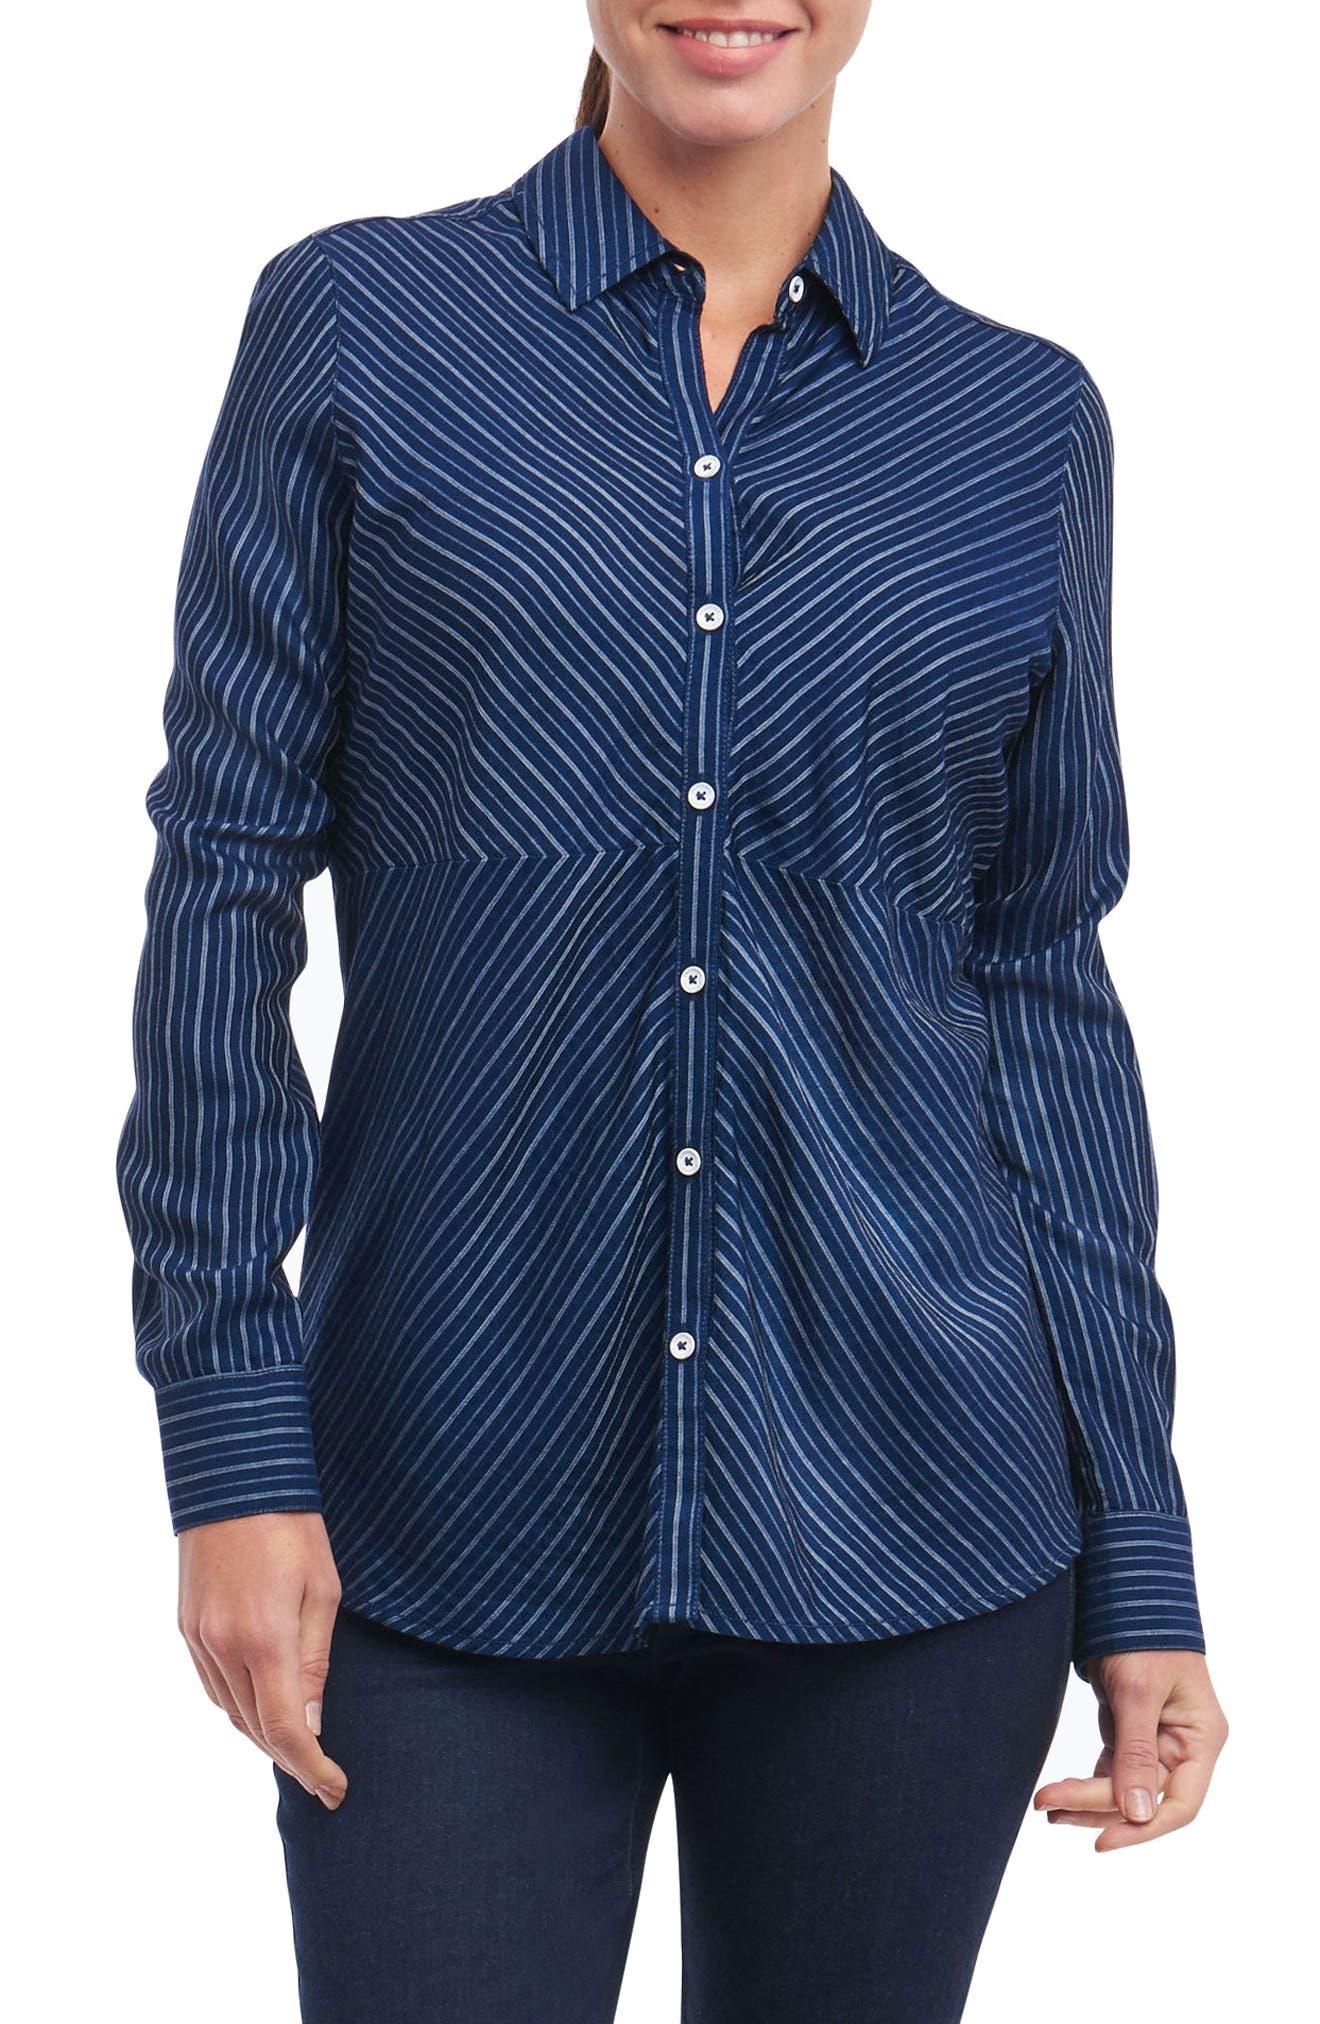 Hazel Pinstripe Shirt,                             Main thumbnail 1, color,                             415